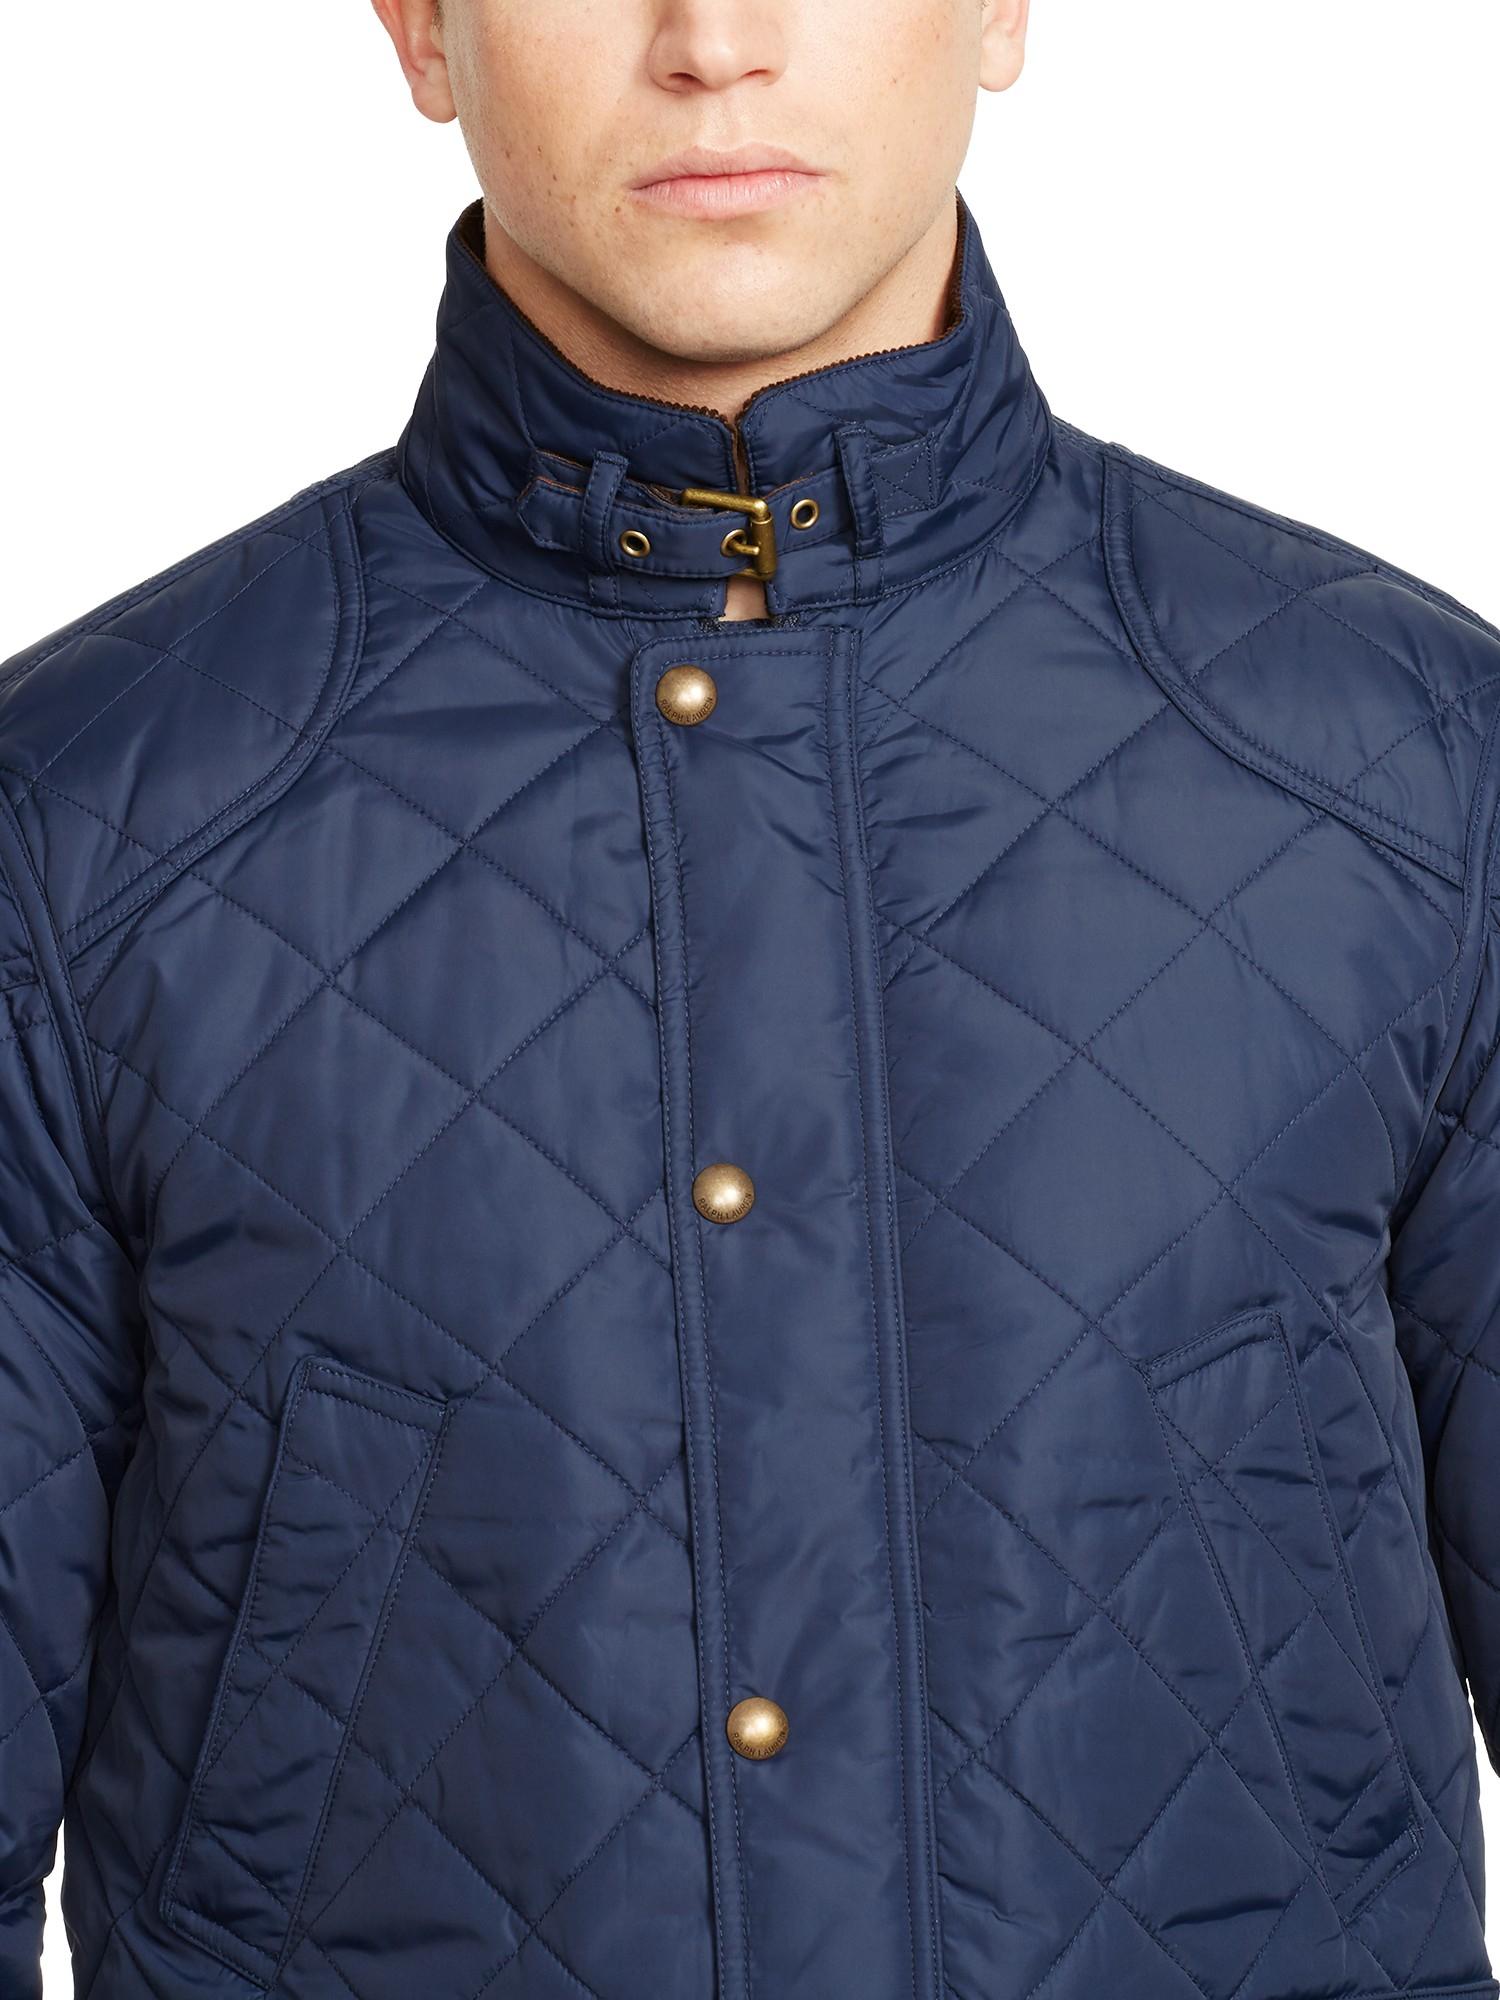 Ralph Lauren Olkalaukku : Polo ralph lauren cadwell quilted bomber jacket in blue